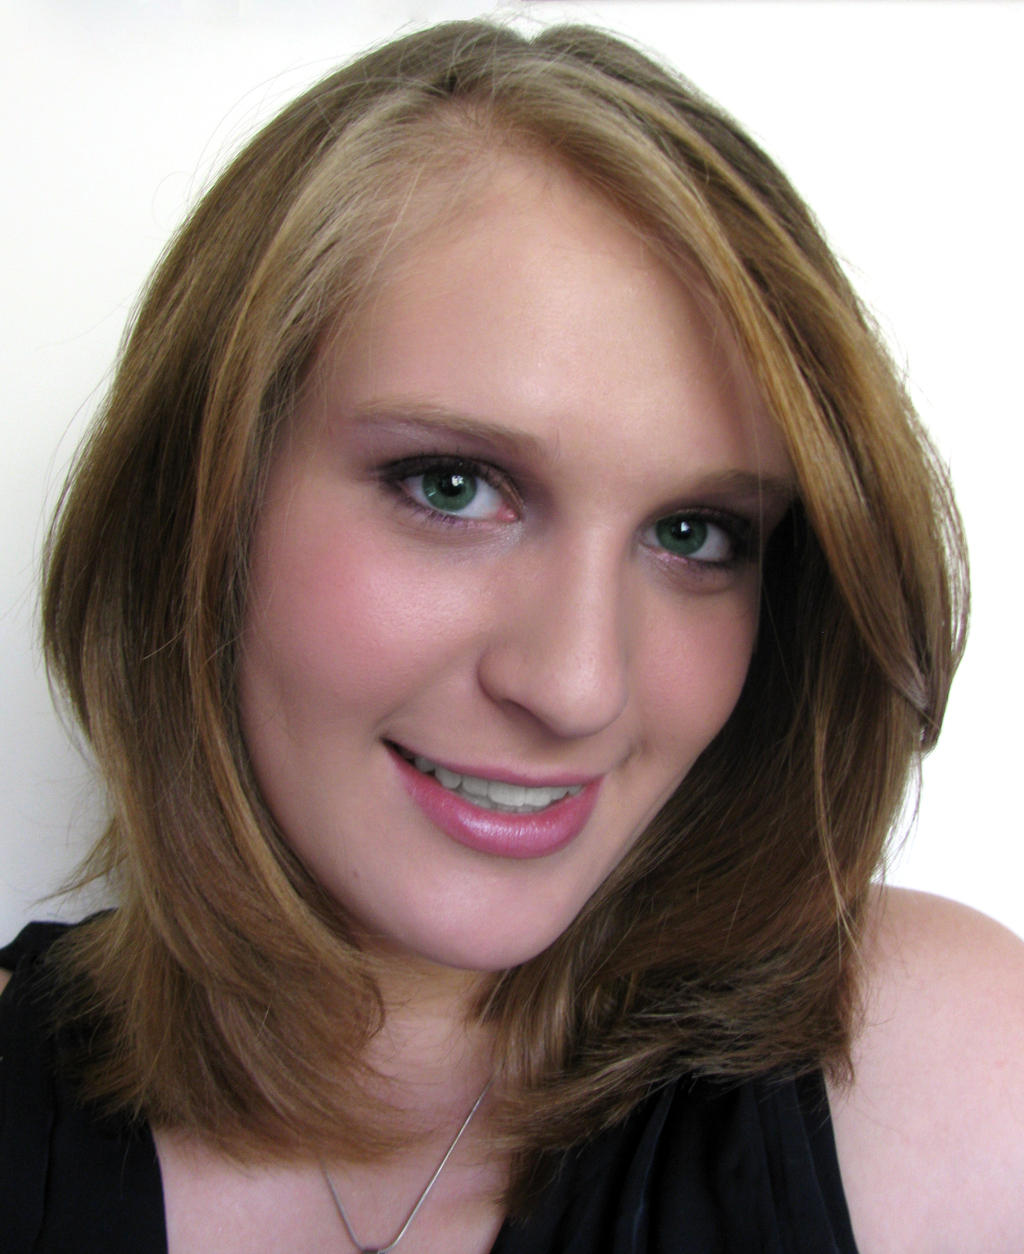 TinyPotsEtc's Profile Picture